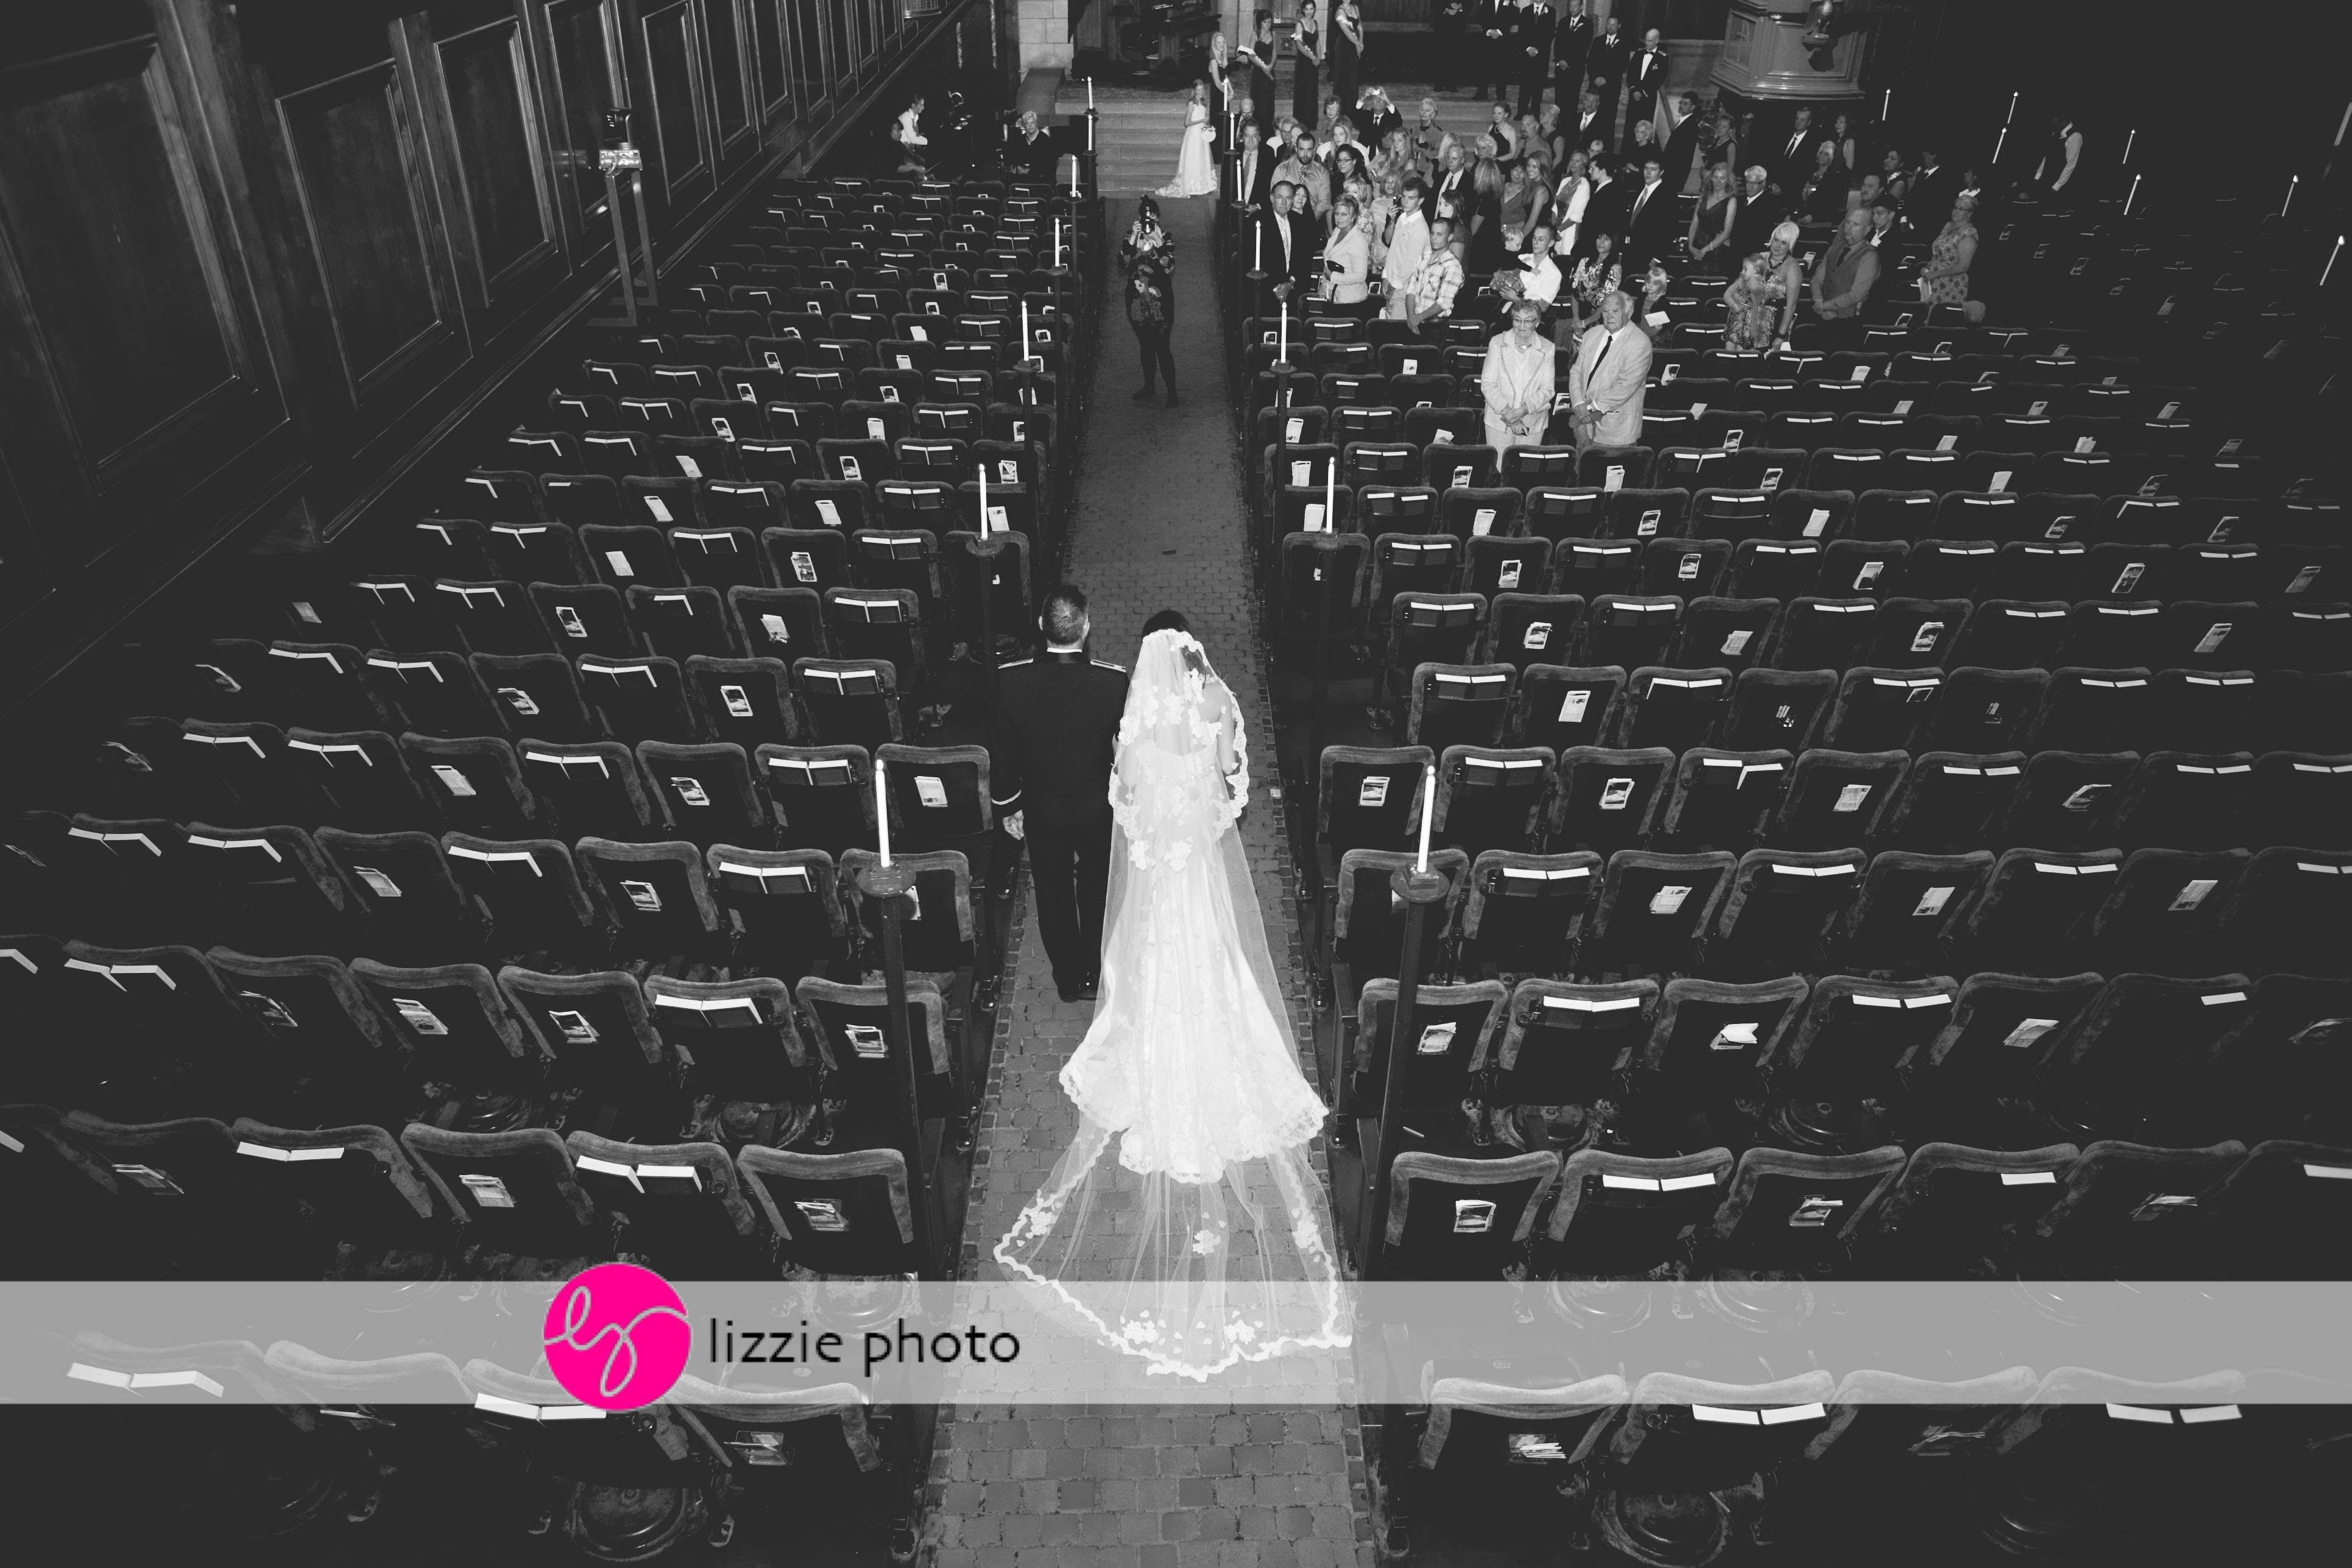 michigan-wedding-photographer-59